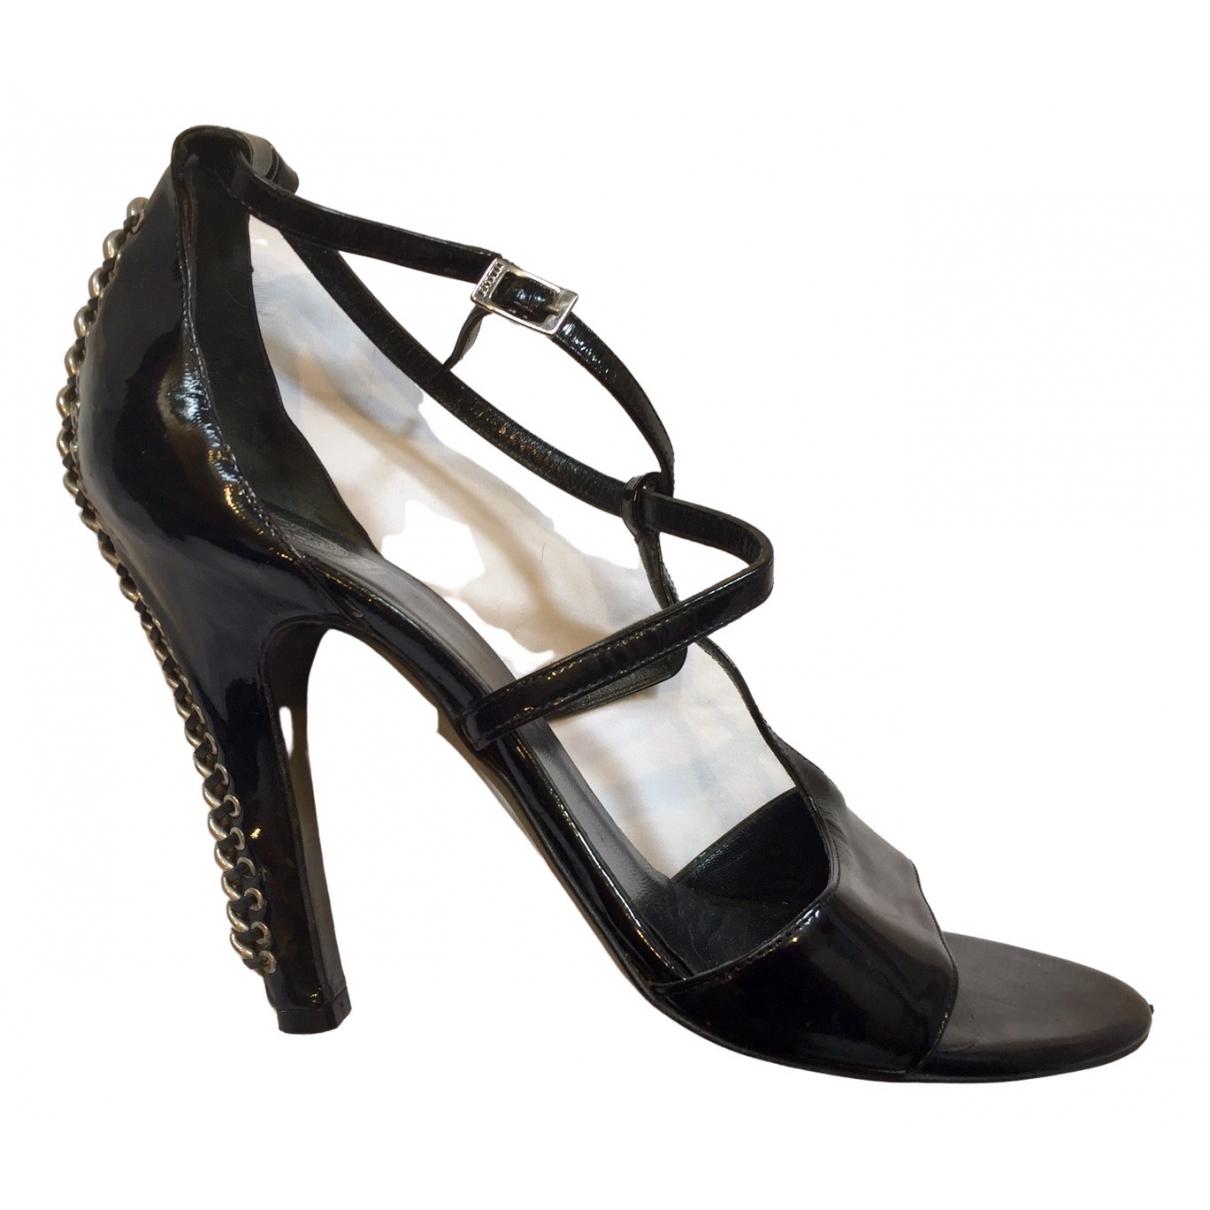 Versace \N Pumps in  Schwarz Lackleder